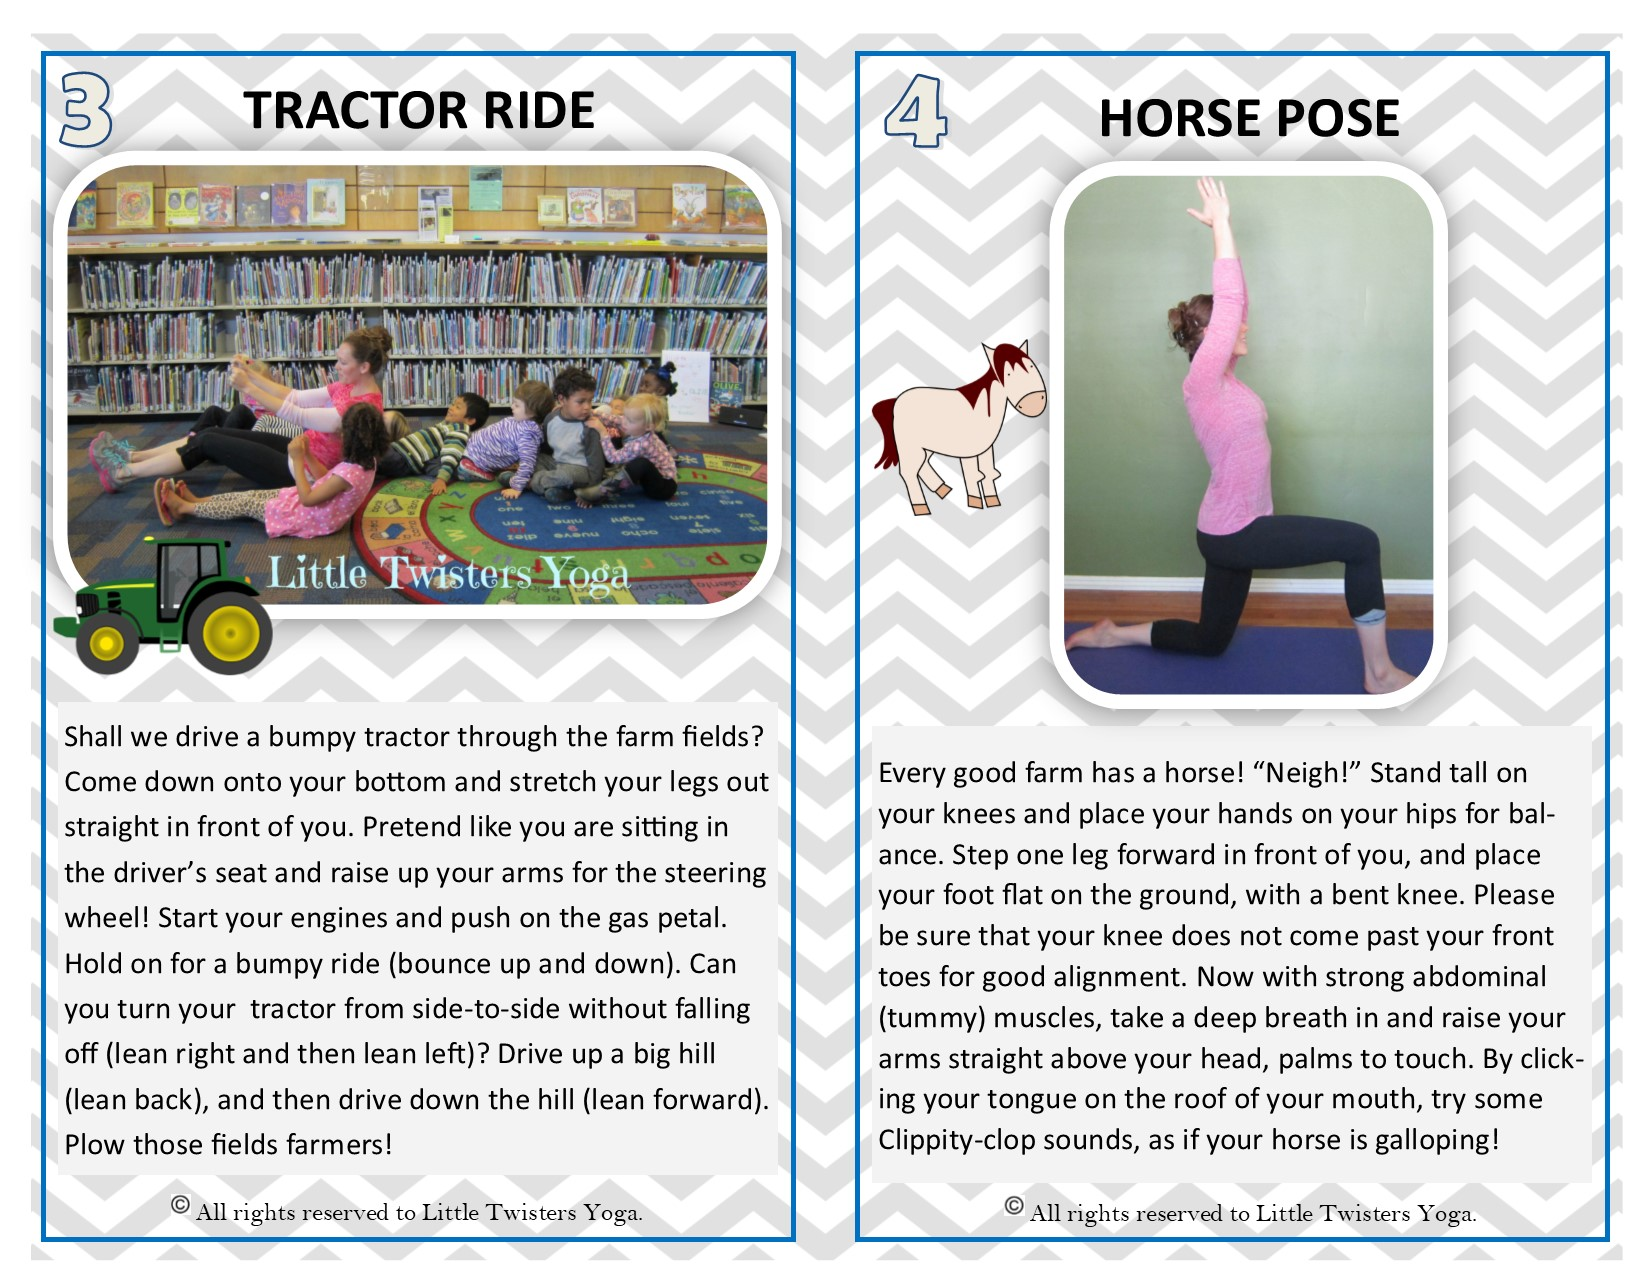 Pleasant Online Store Little Twisters Yoga Emotional Wellness Ibusinesslaw Wood Chair Design Ideas Ibusinesslaworg